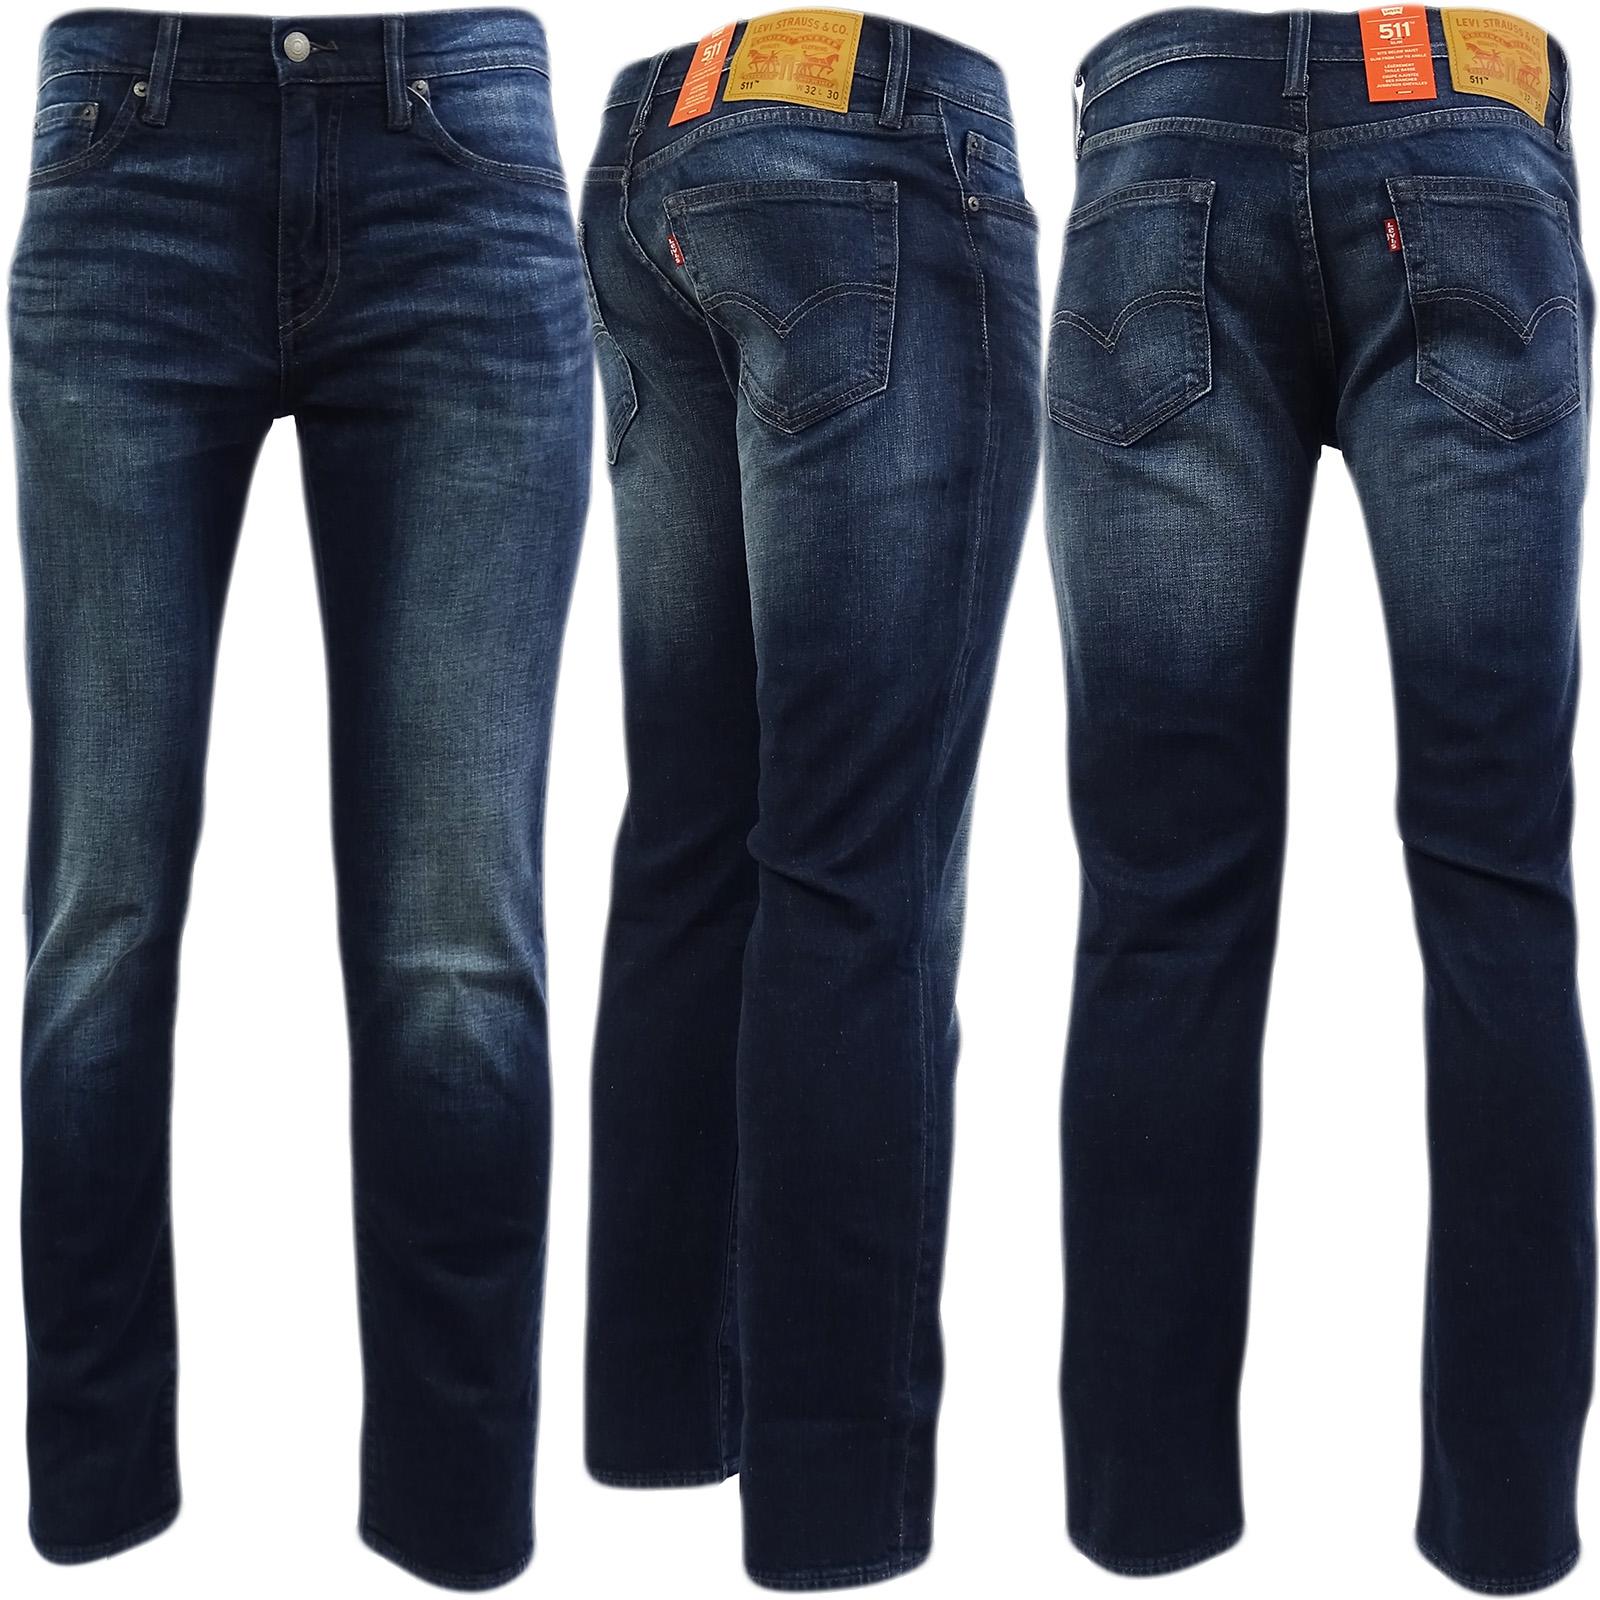 6717ae2f7c126 Levi Strauss 511 Slim Leg Jean Indigo Blue With Fading